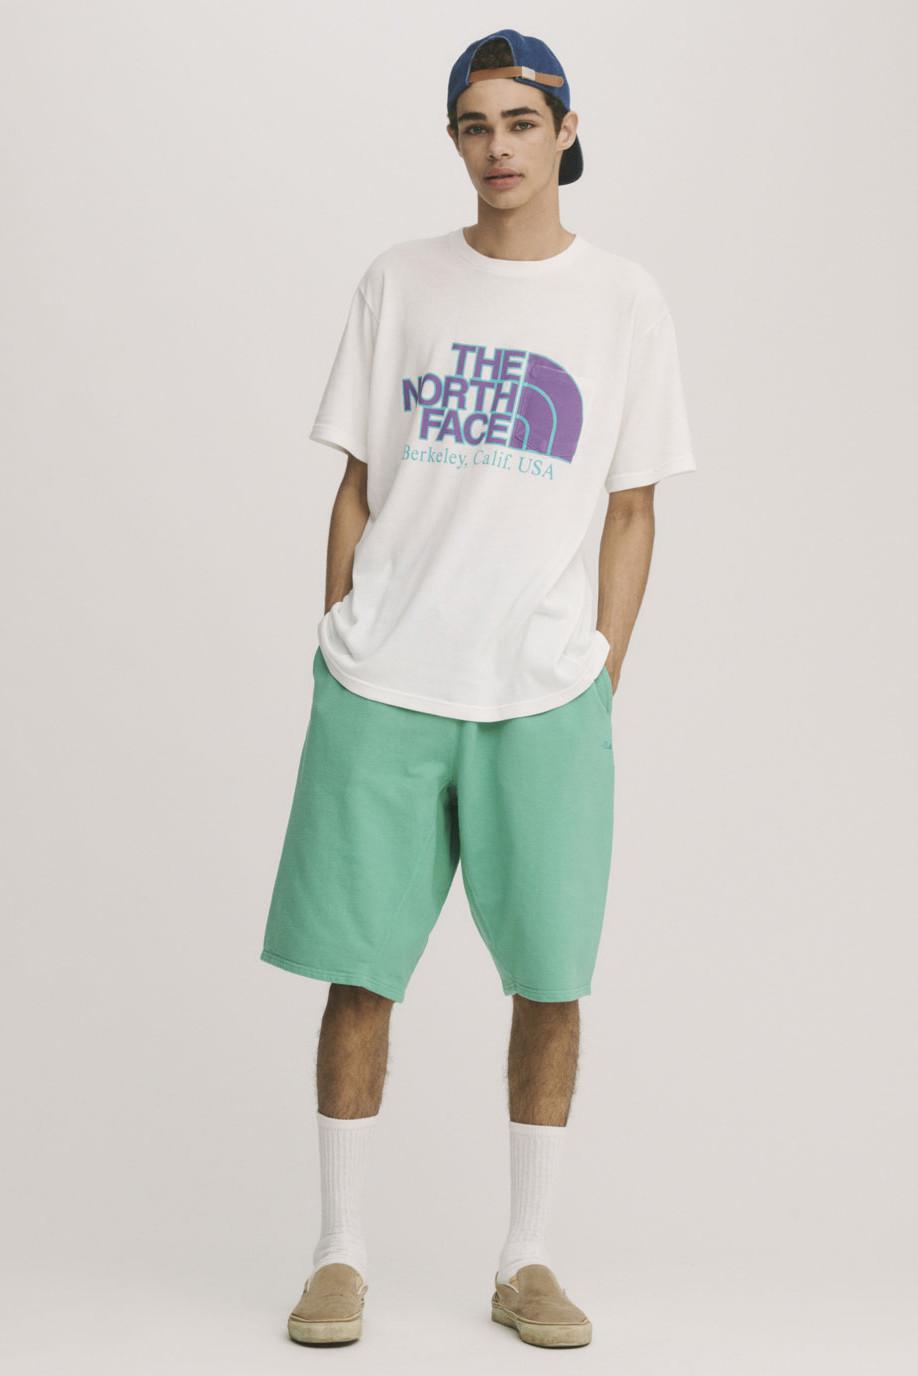 https---hypebeast.com-image-2019-01-the-north-face-purple-label-spring-summer-2019-lookbook-19